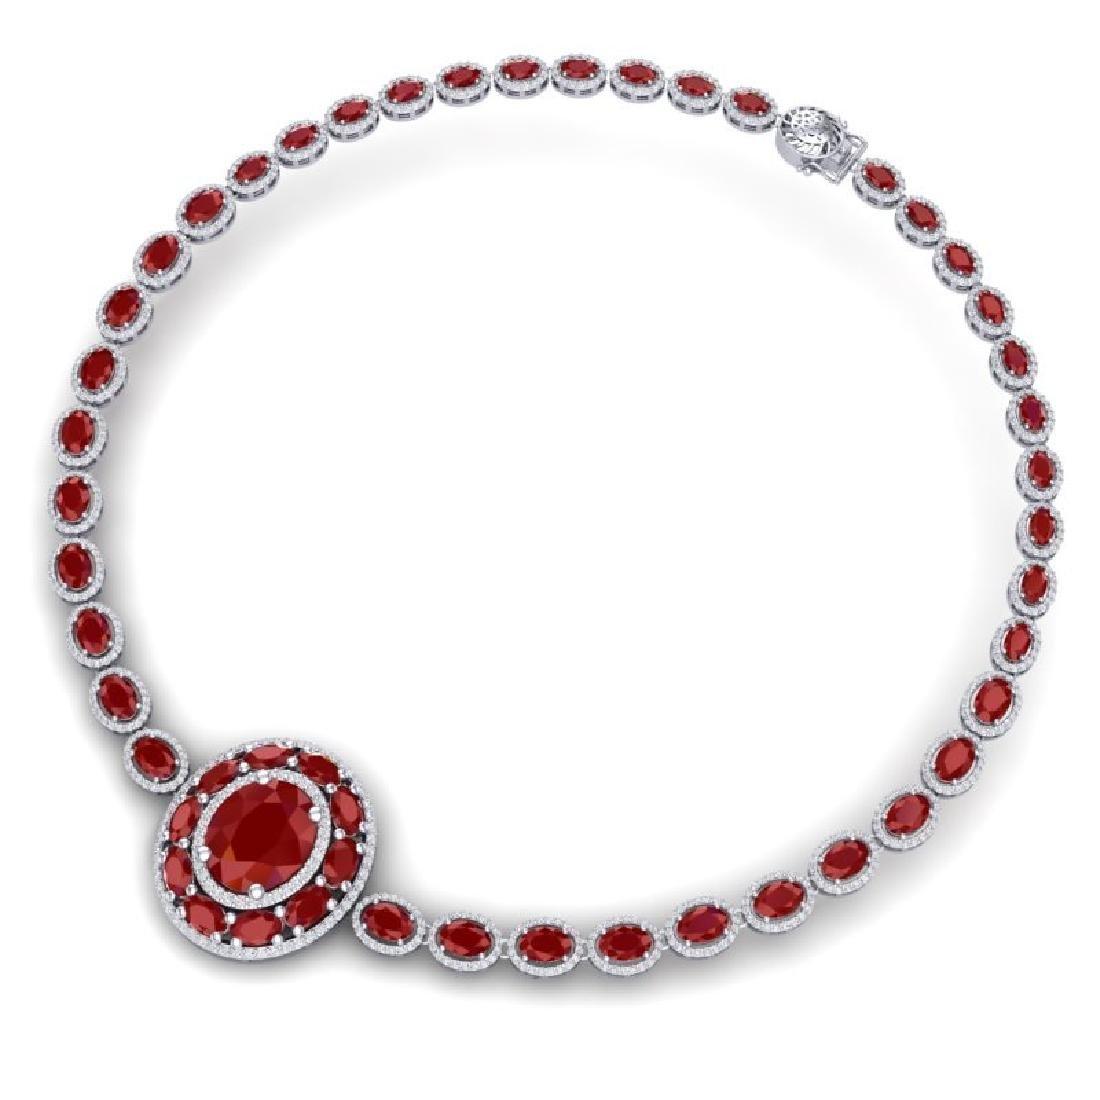 43.54 CTW Royalty Ruby & VS Diamond Necklace 18K White - 3